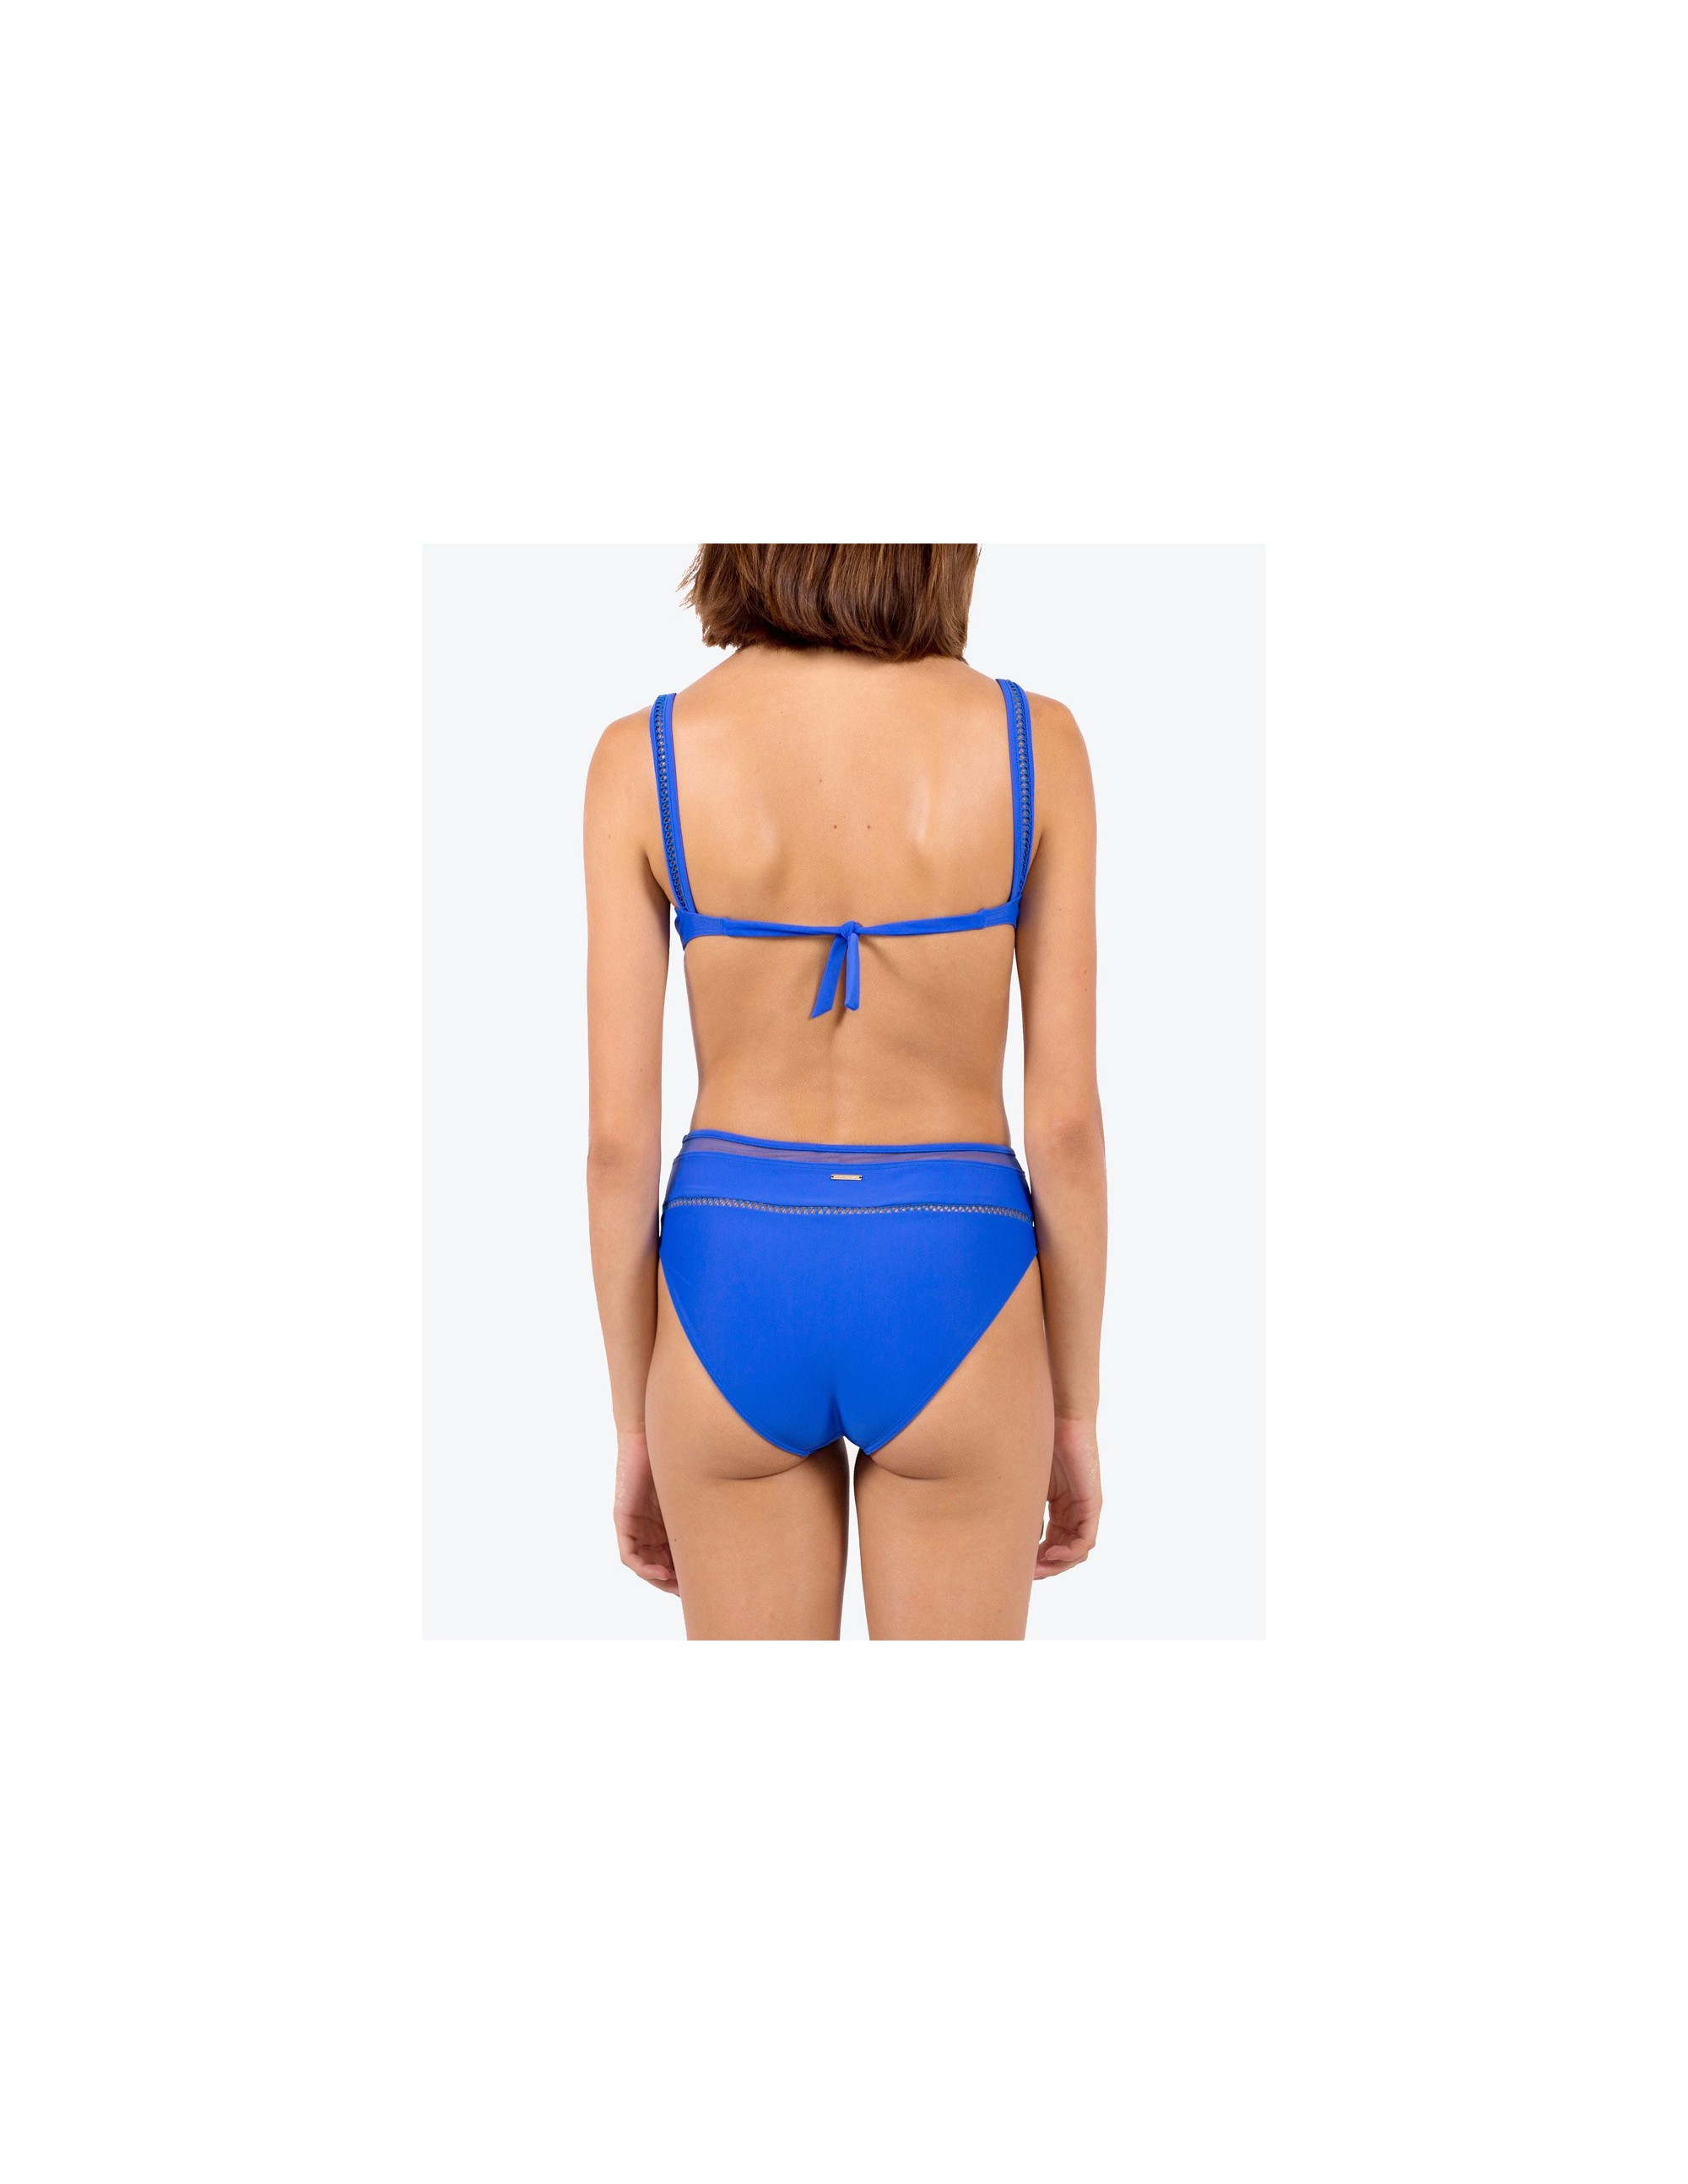 SIMOS bikini top - ECHO BLUE